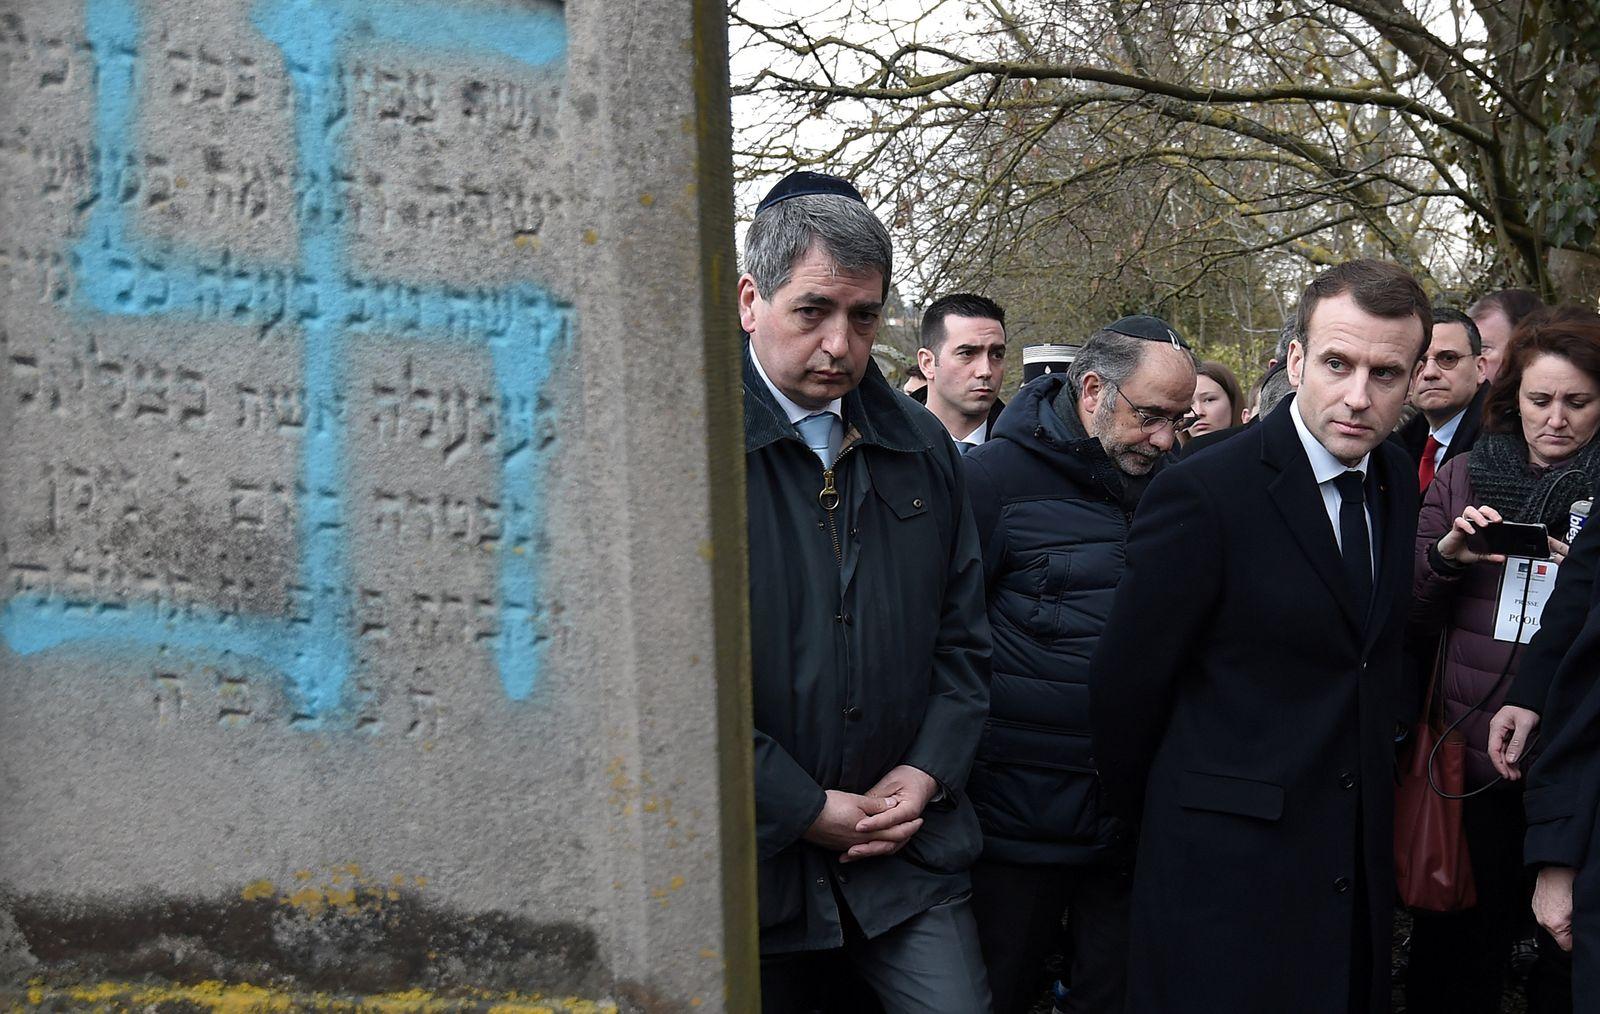 FILE PHOTO: French President Emmanuel Macron visits a Jewish cemetery in Quatzenheim